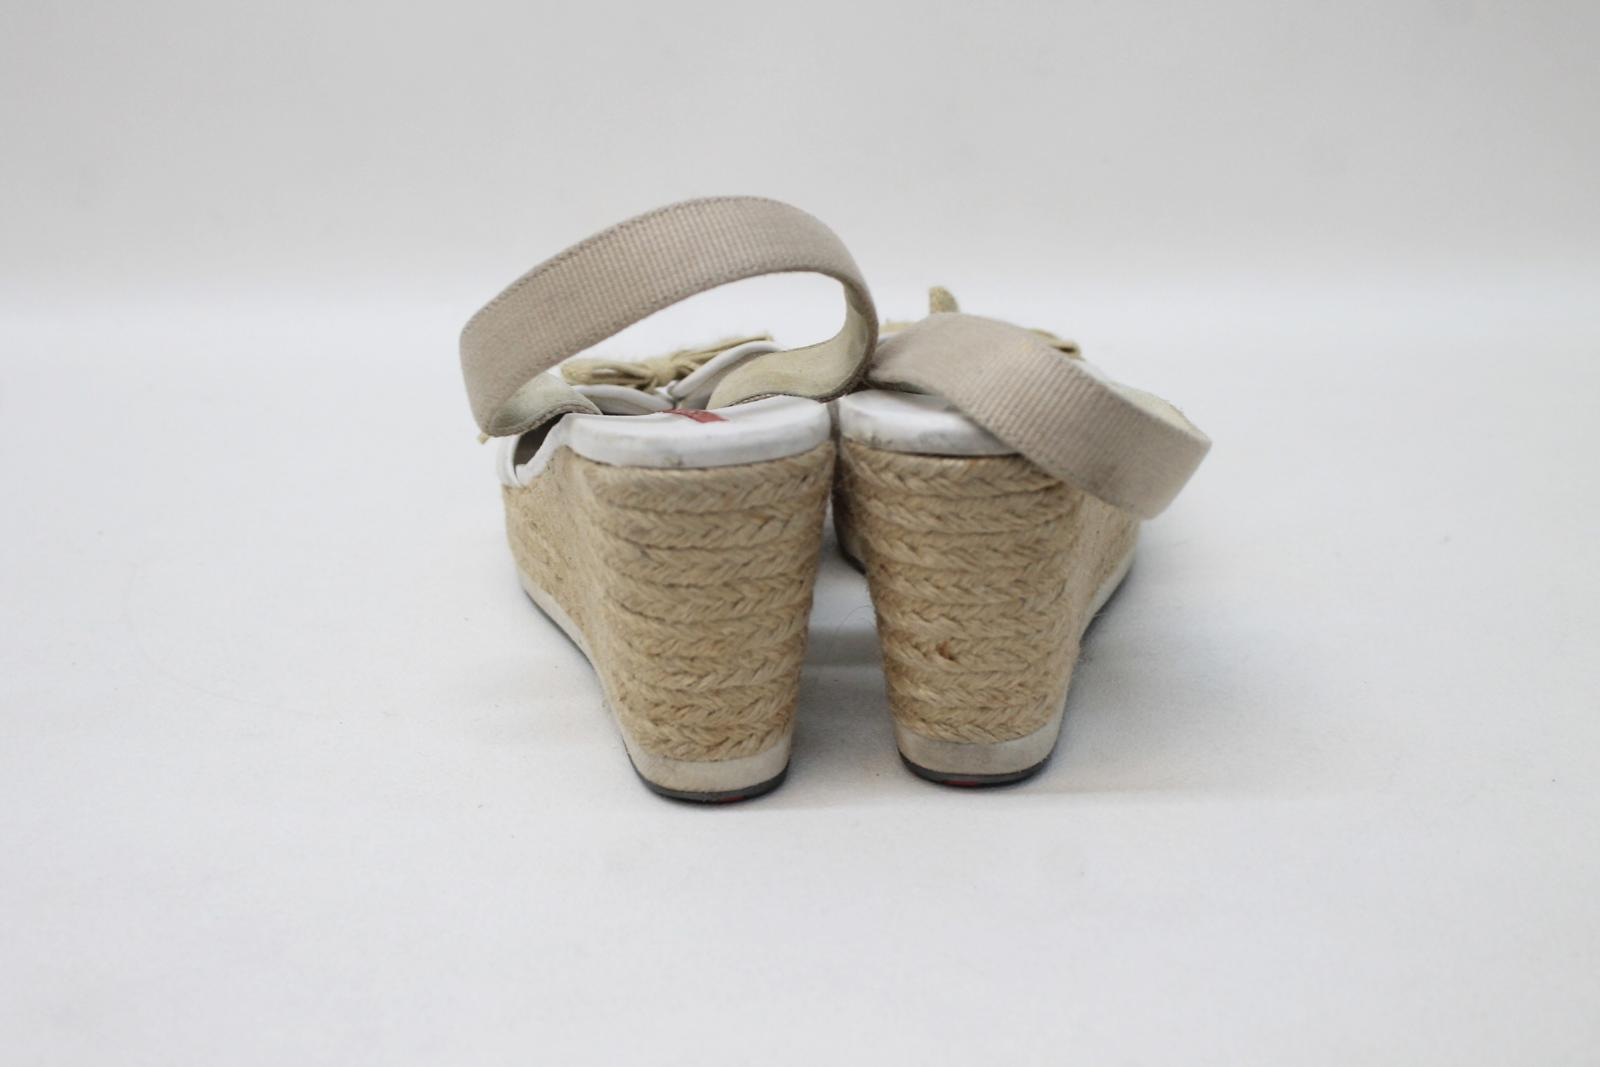 Espadrillas Zeppe Sandali Dimensioni Prada Platform White Ladies Beige UK5 ca wqZXF